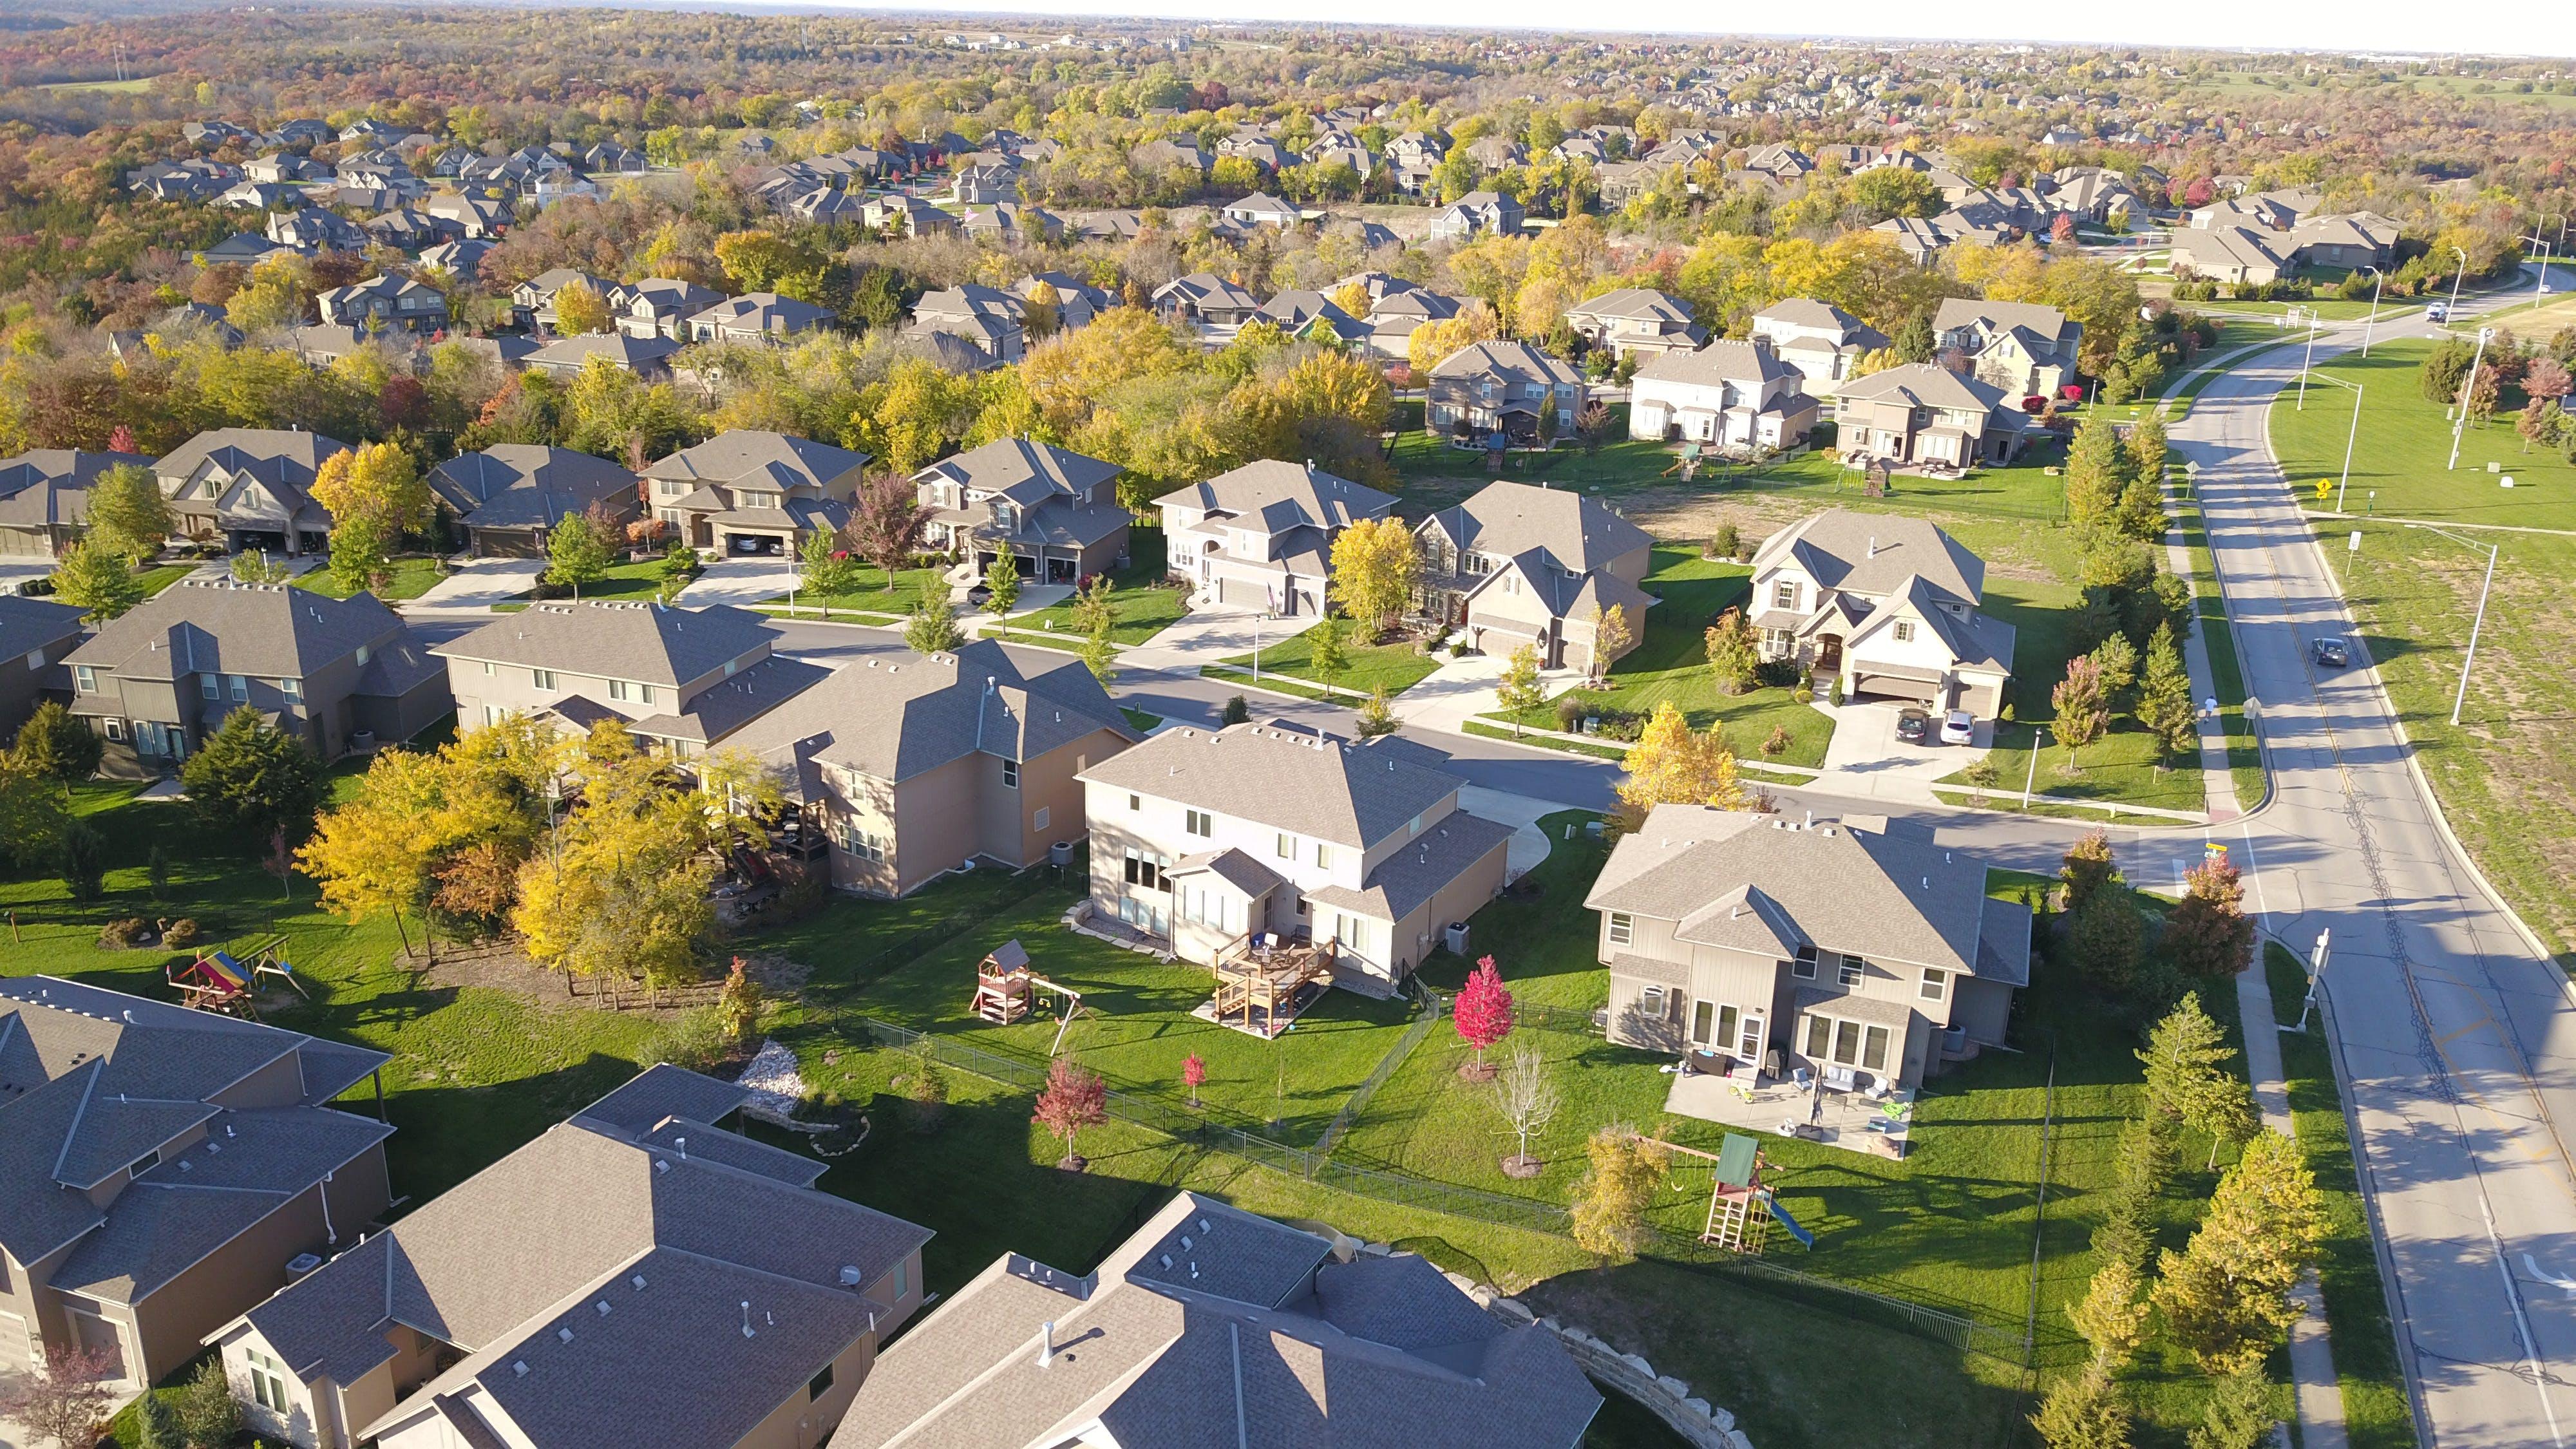 Free stock photo of houses, aerial, neighborhood, real estate